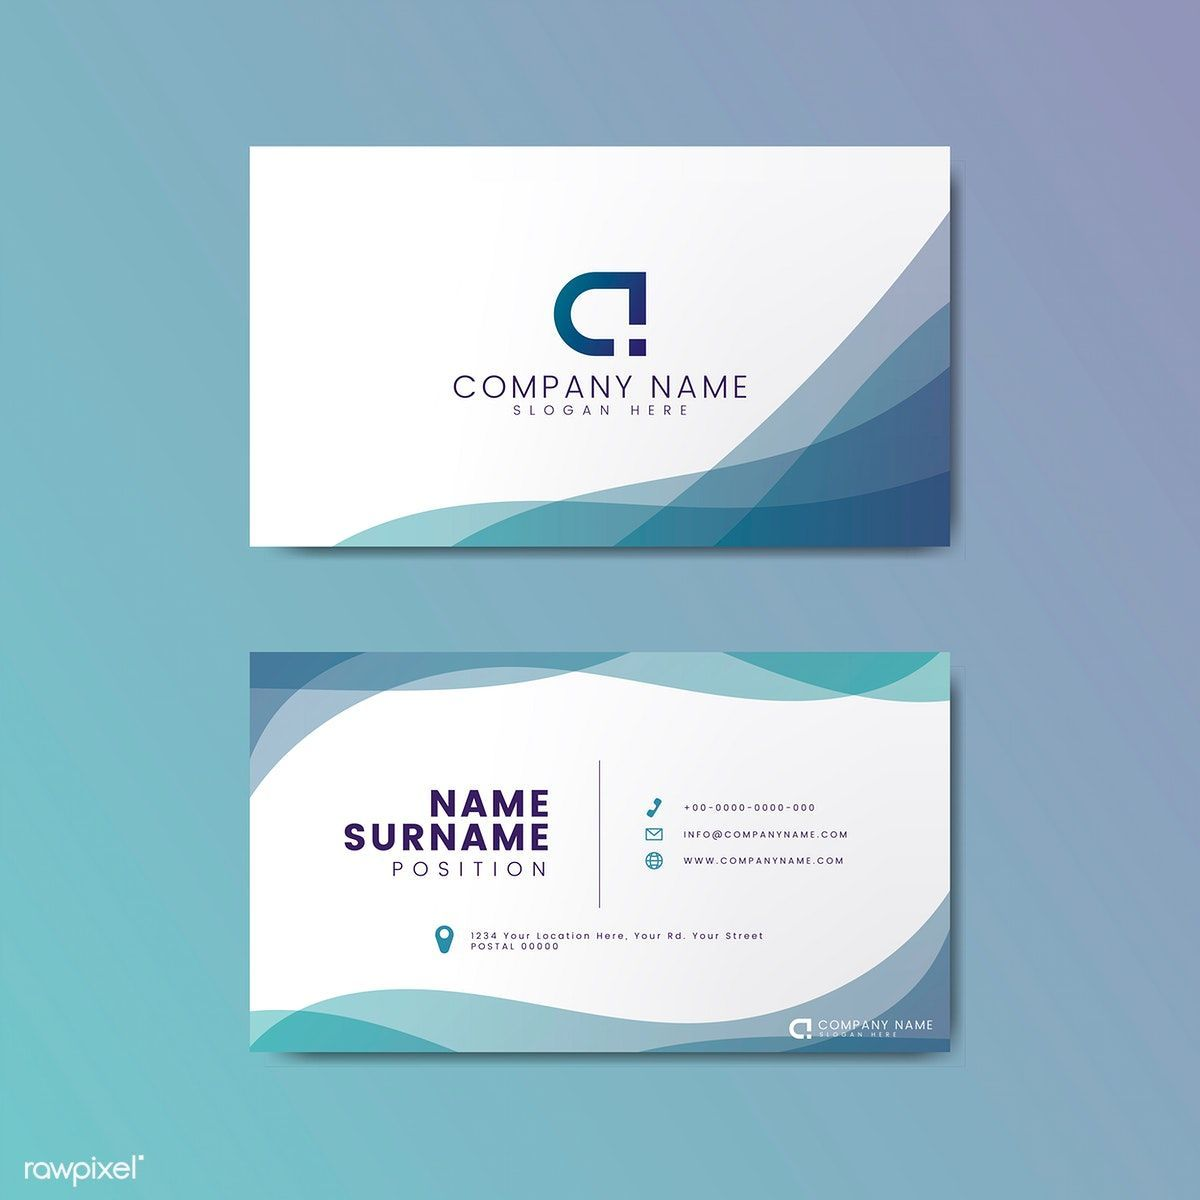 The mesmerizing Modern Geometric Business Card Design  Free Image